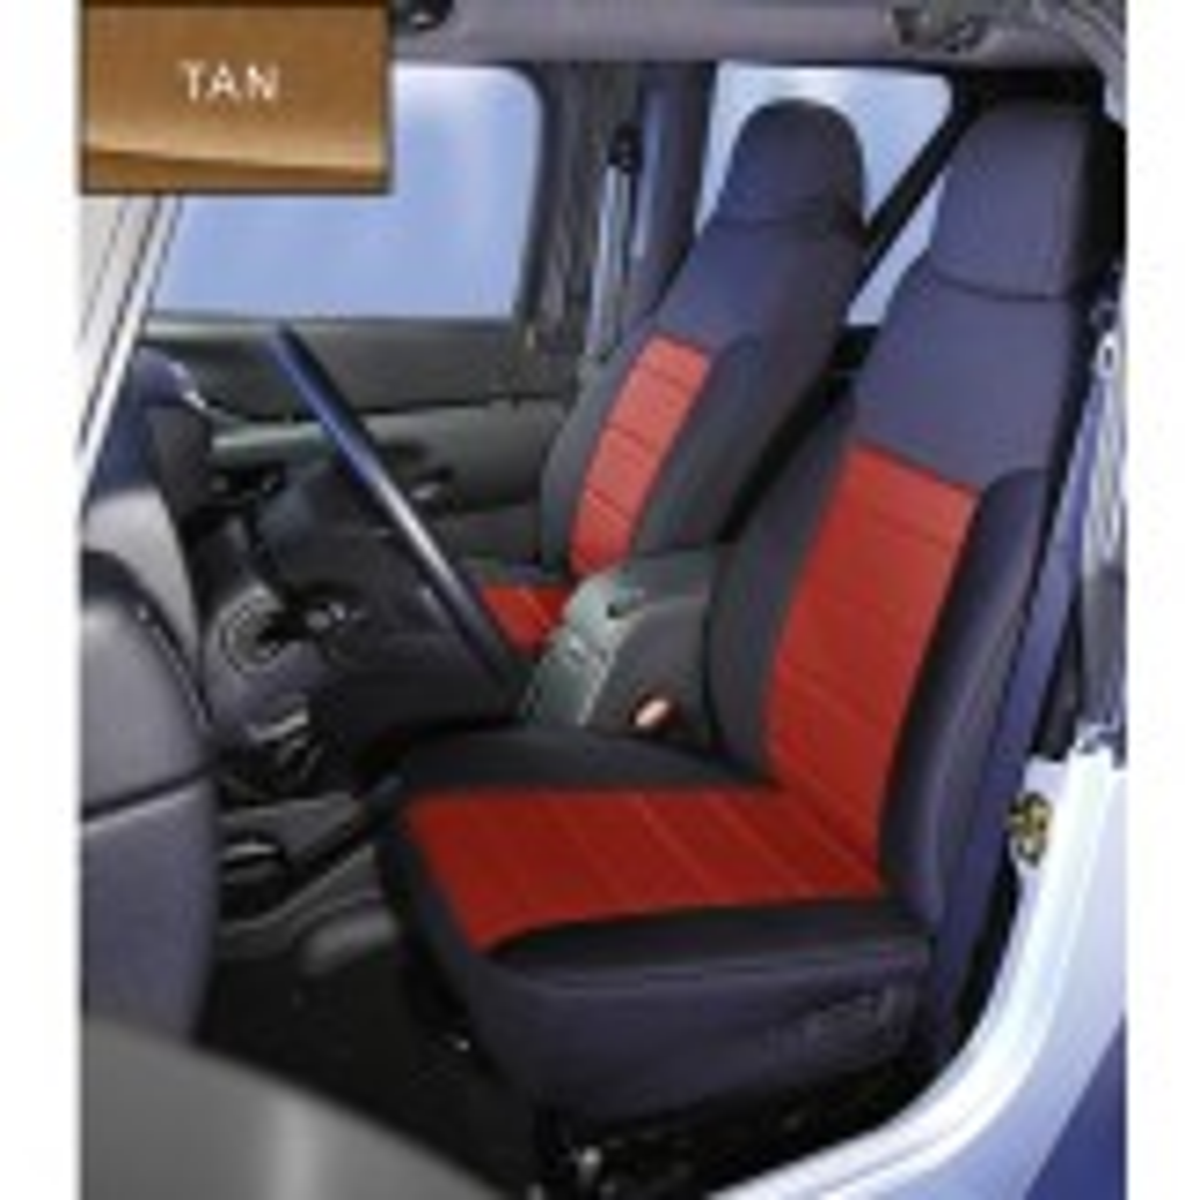 Neoprene Front Seat Covers, Tan; 91-95 Jeep Wrangler YJ